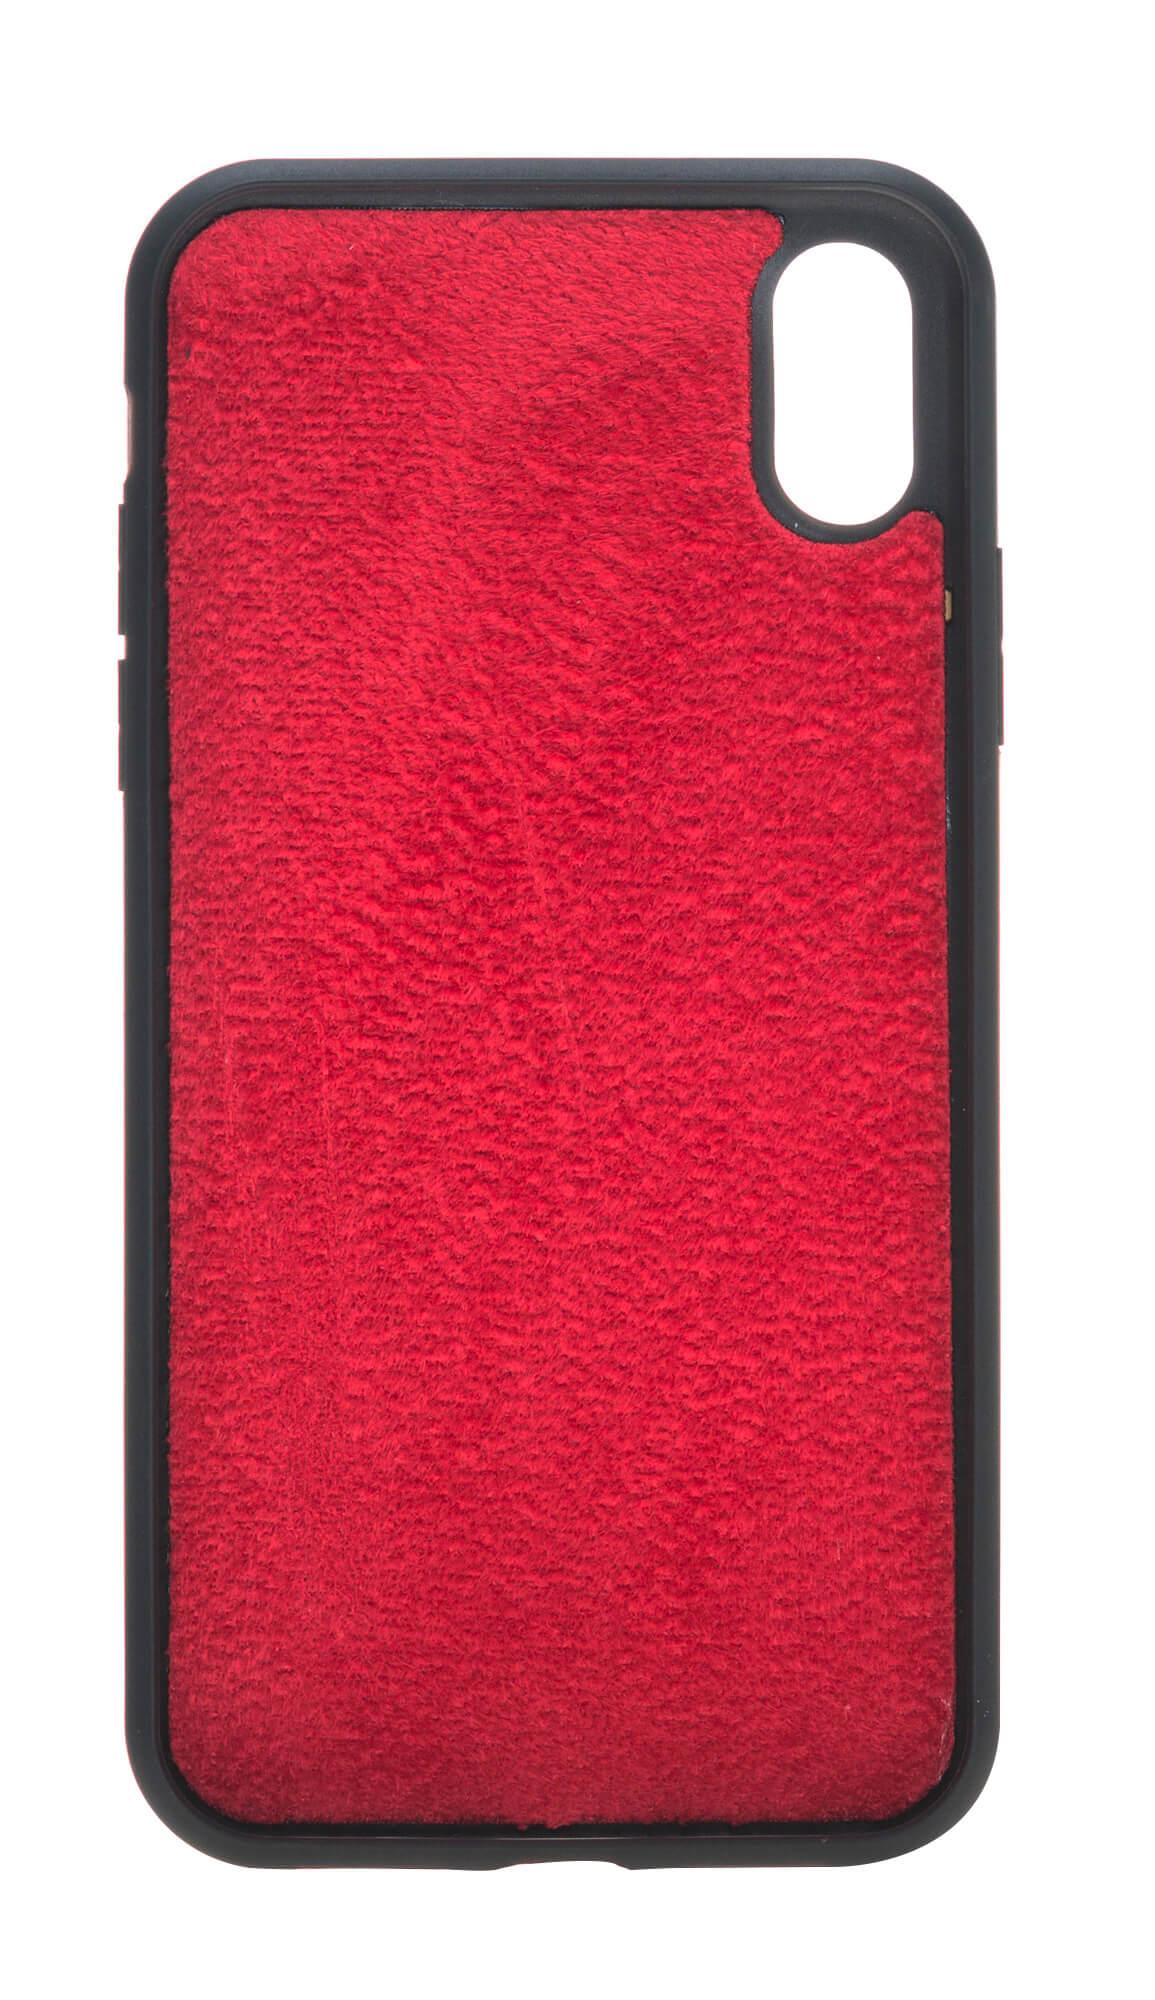 iPhone XR 6.1 Zoll Abnehmbare Lederhülle (2in1) in Rot Burned